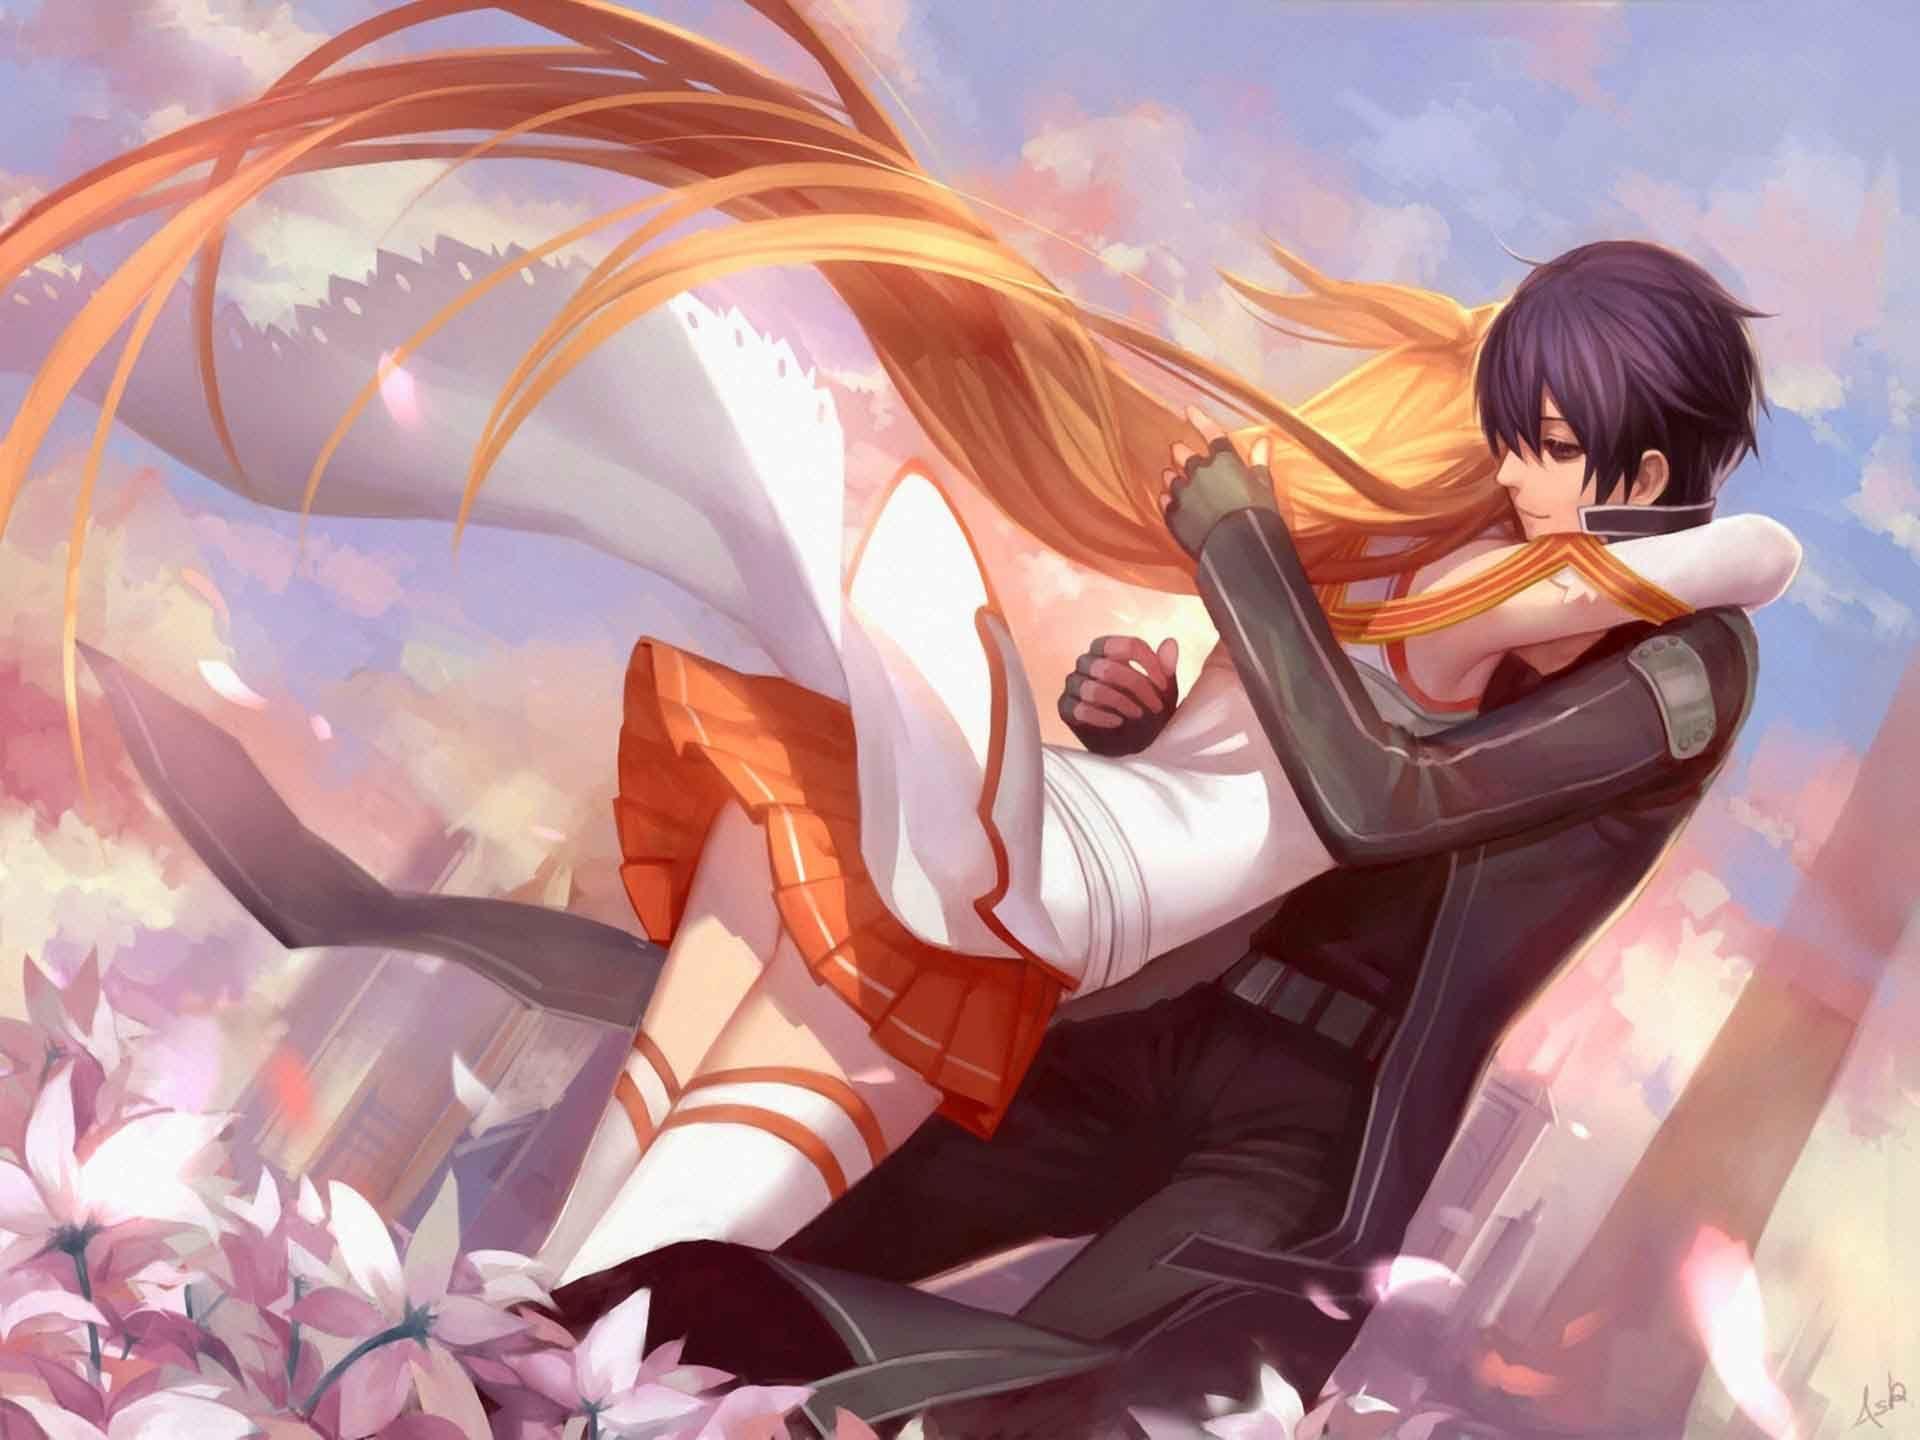 Anime Couple Hug Latest Hd Wallpapers Free Download New Hd Wallpapers Download Anime Love Sword Art Online Asuna Sword Art Online